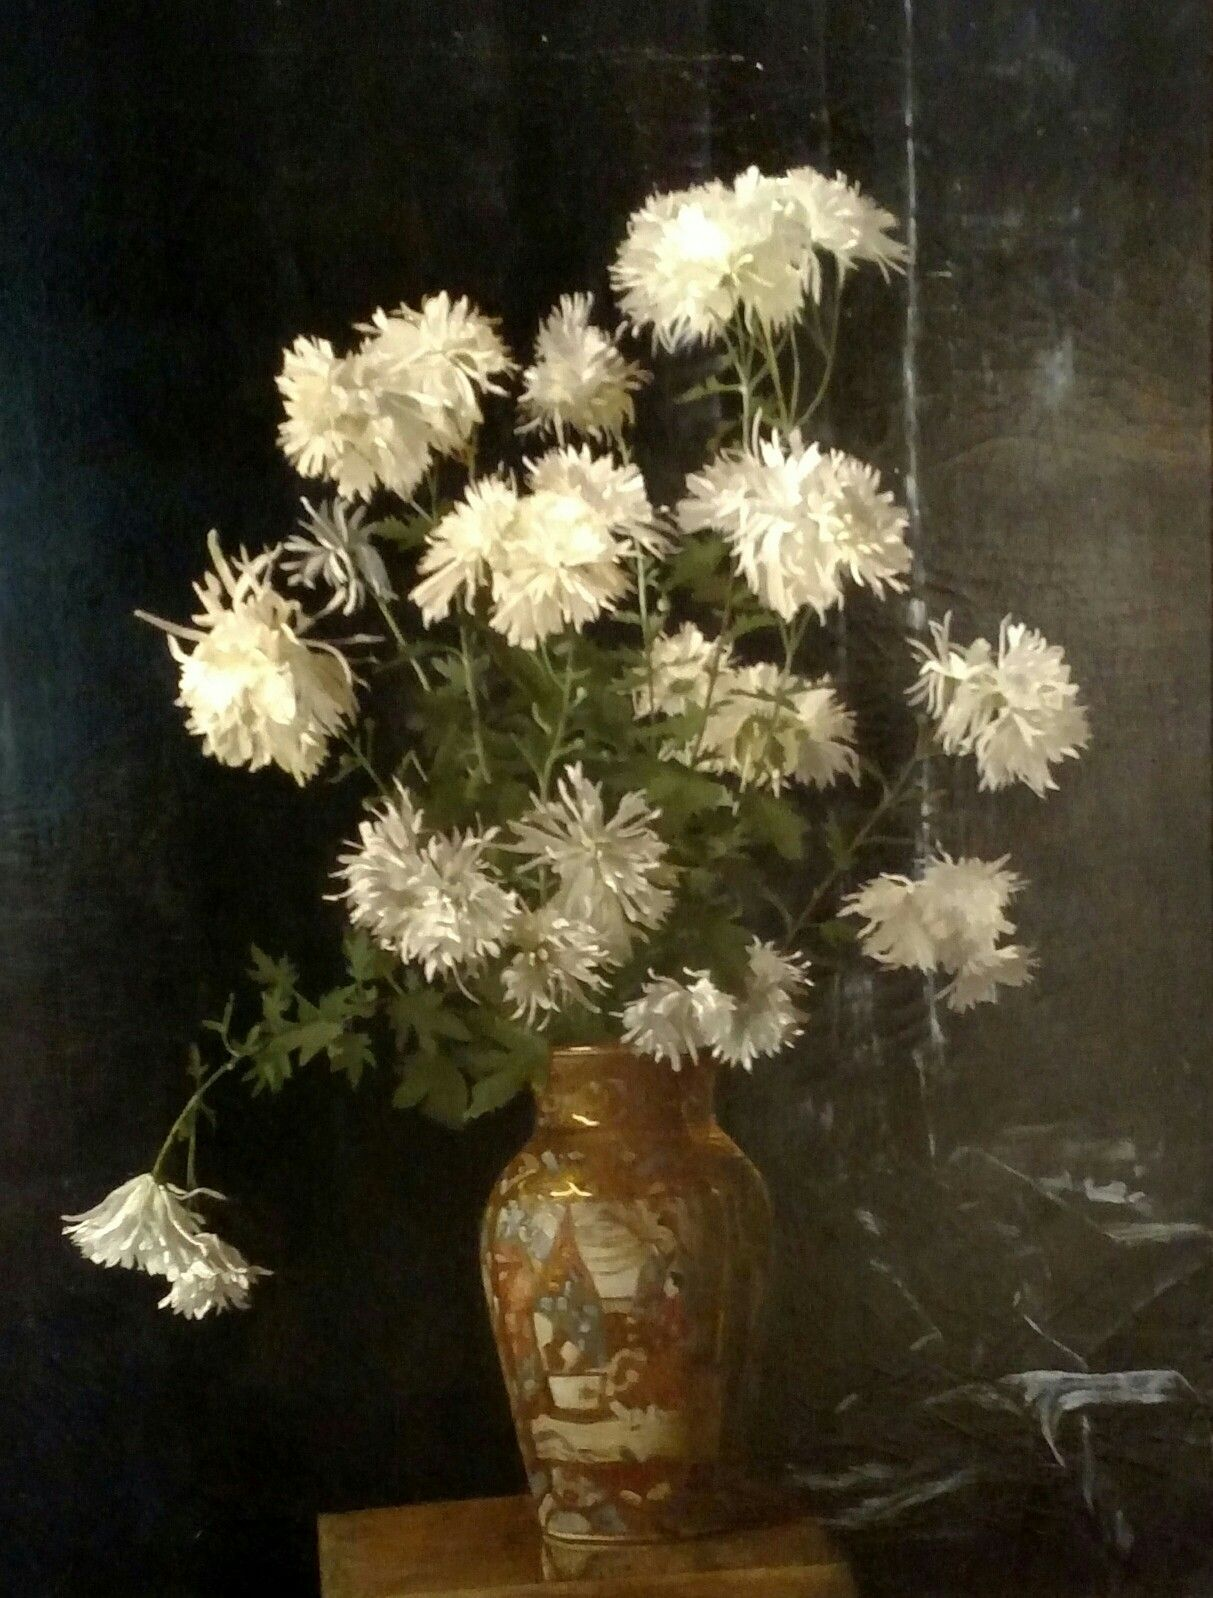 Untitled Oriental Vase With White Chrysanthemums 1888 Alberta Binford Mccloskey American 1885 1911 Gift Of Mrs Ele Oriental Vase Art American Painting